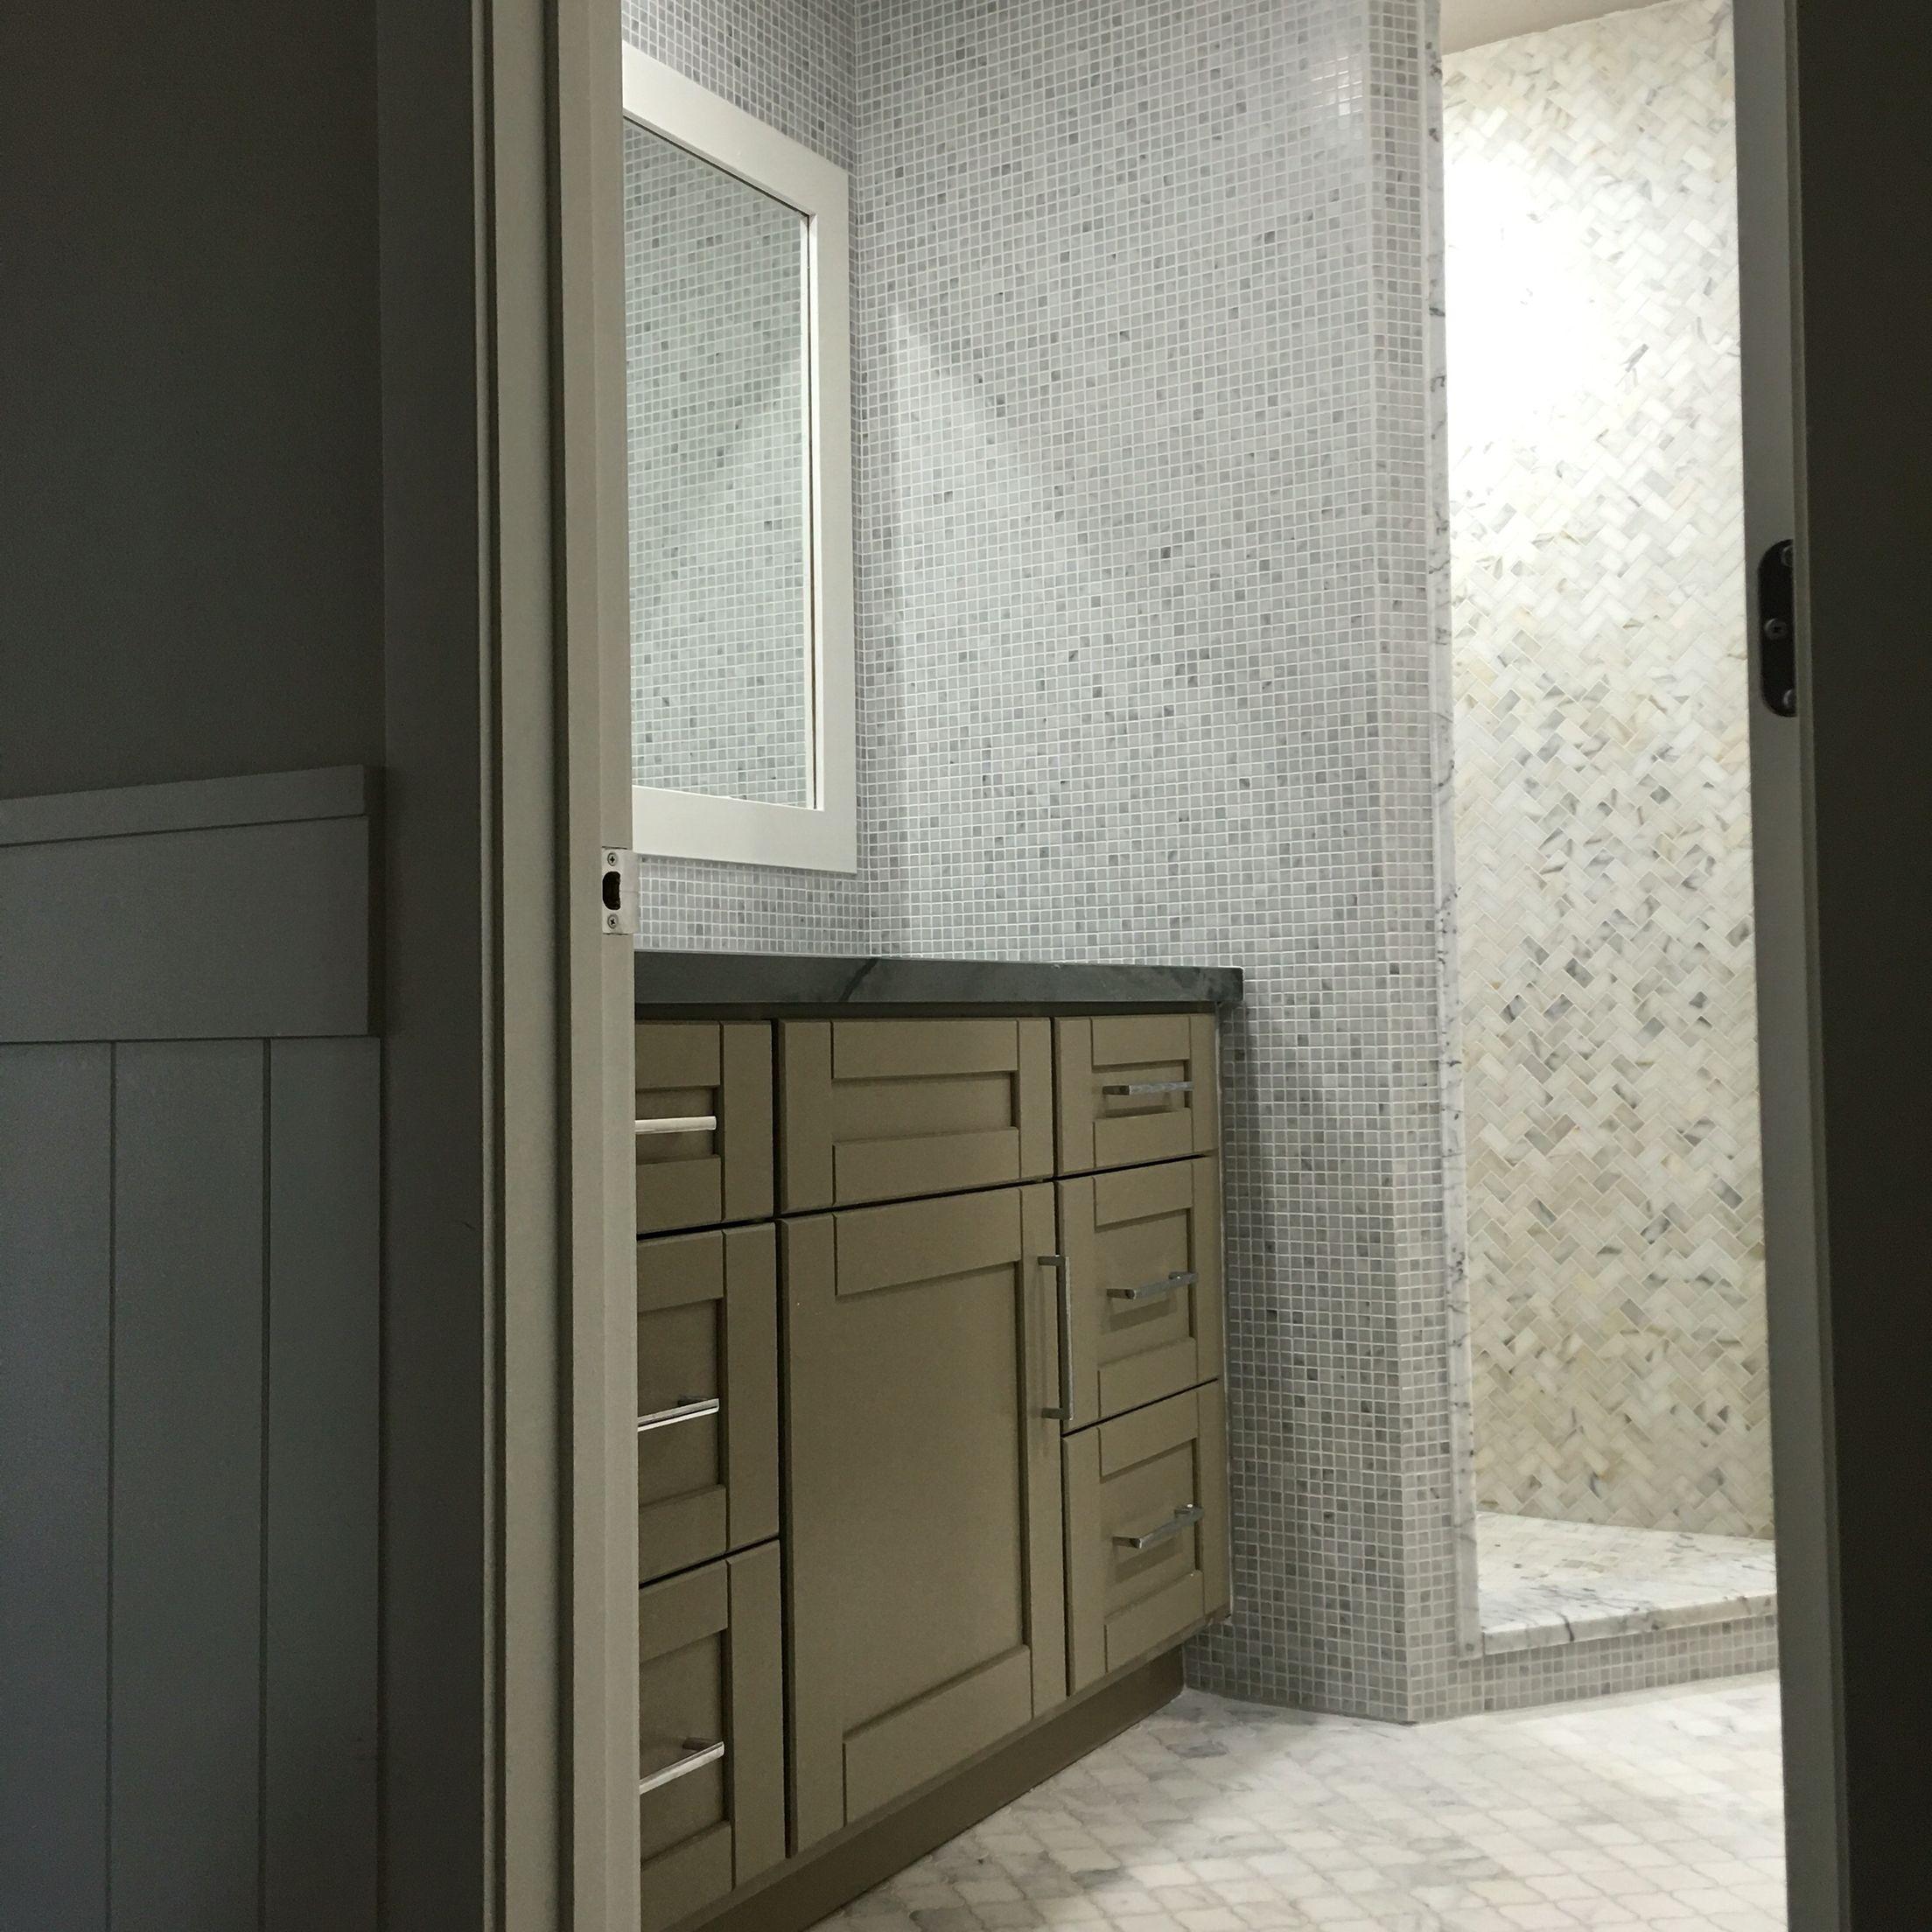 Carrara white marble arabesque mosaic floor tile heated by ditra carrara white marble arabesque mosaic floor tile heated by ditra heating system 1x2 calacatta dailygadgetfo Gallery